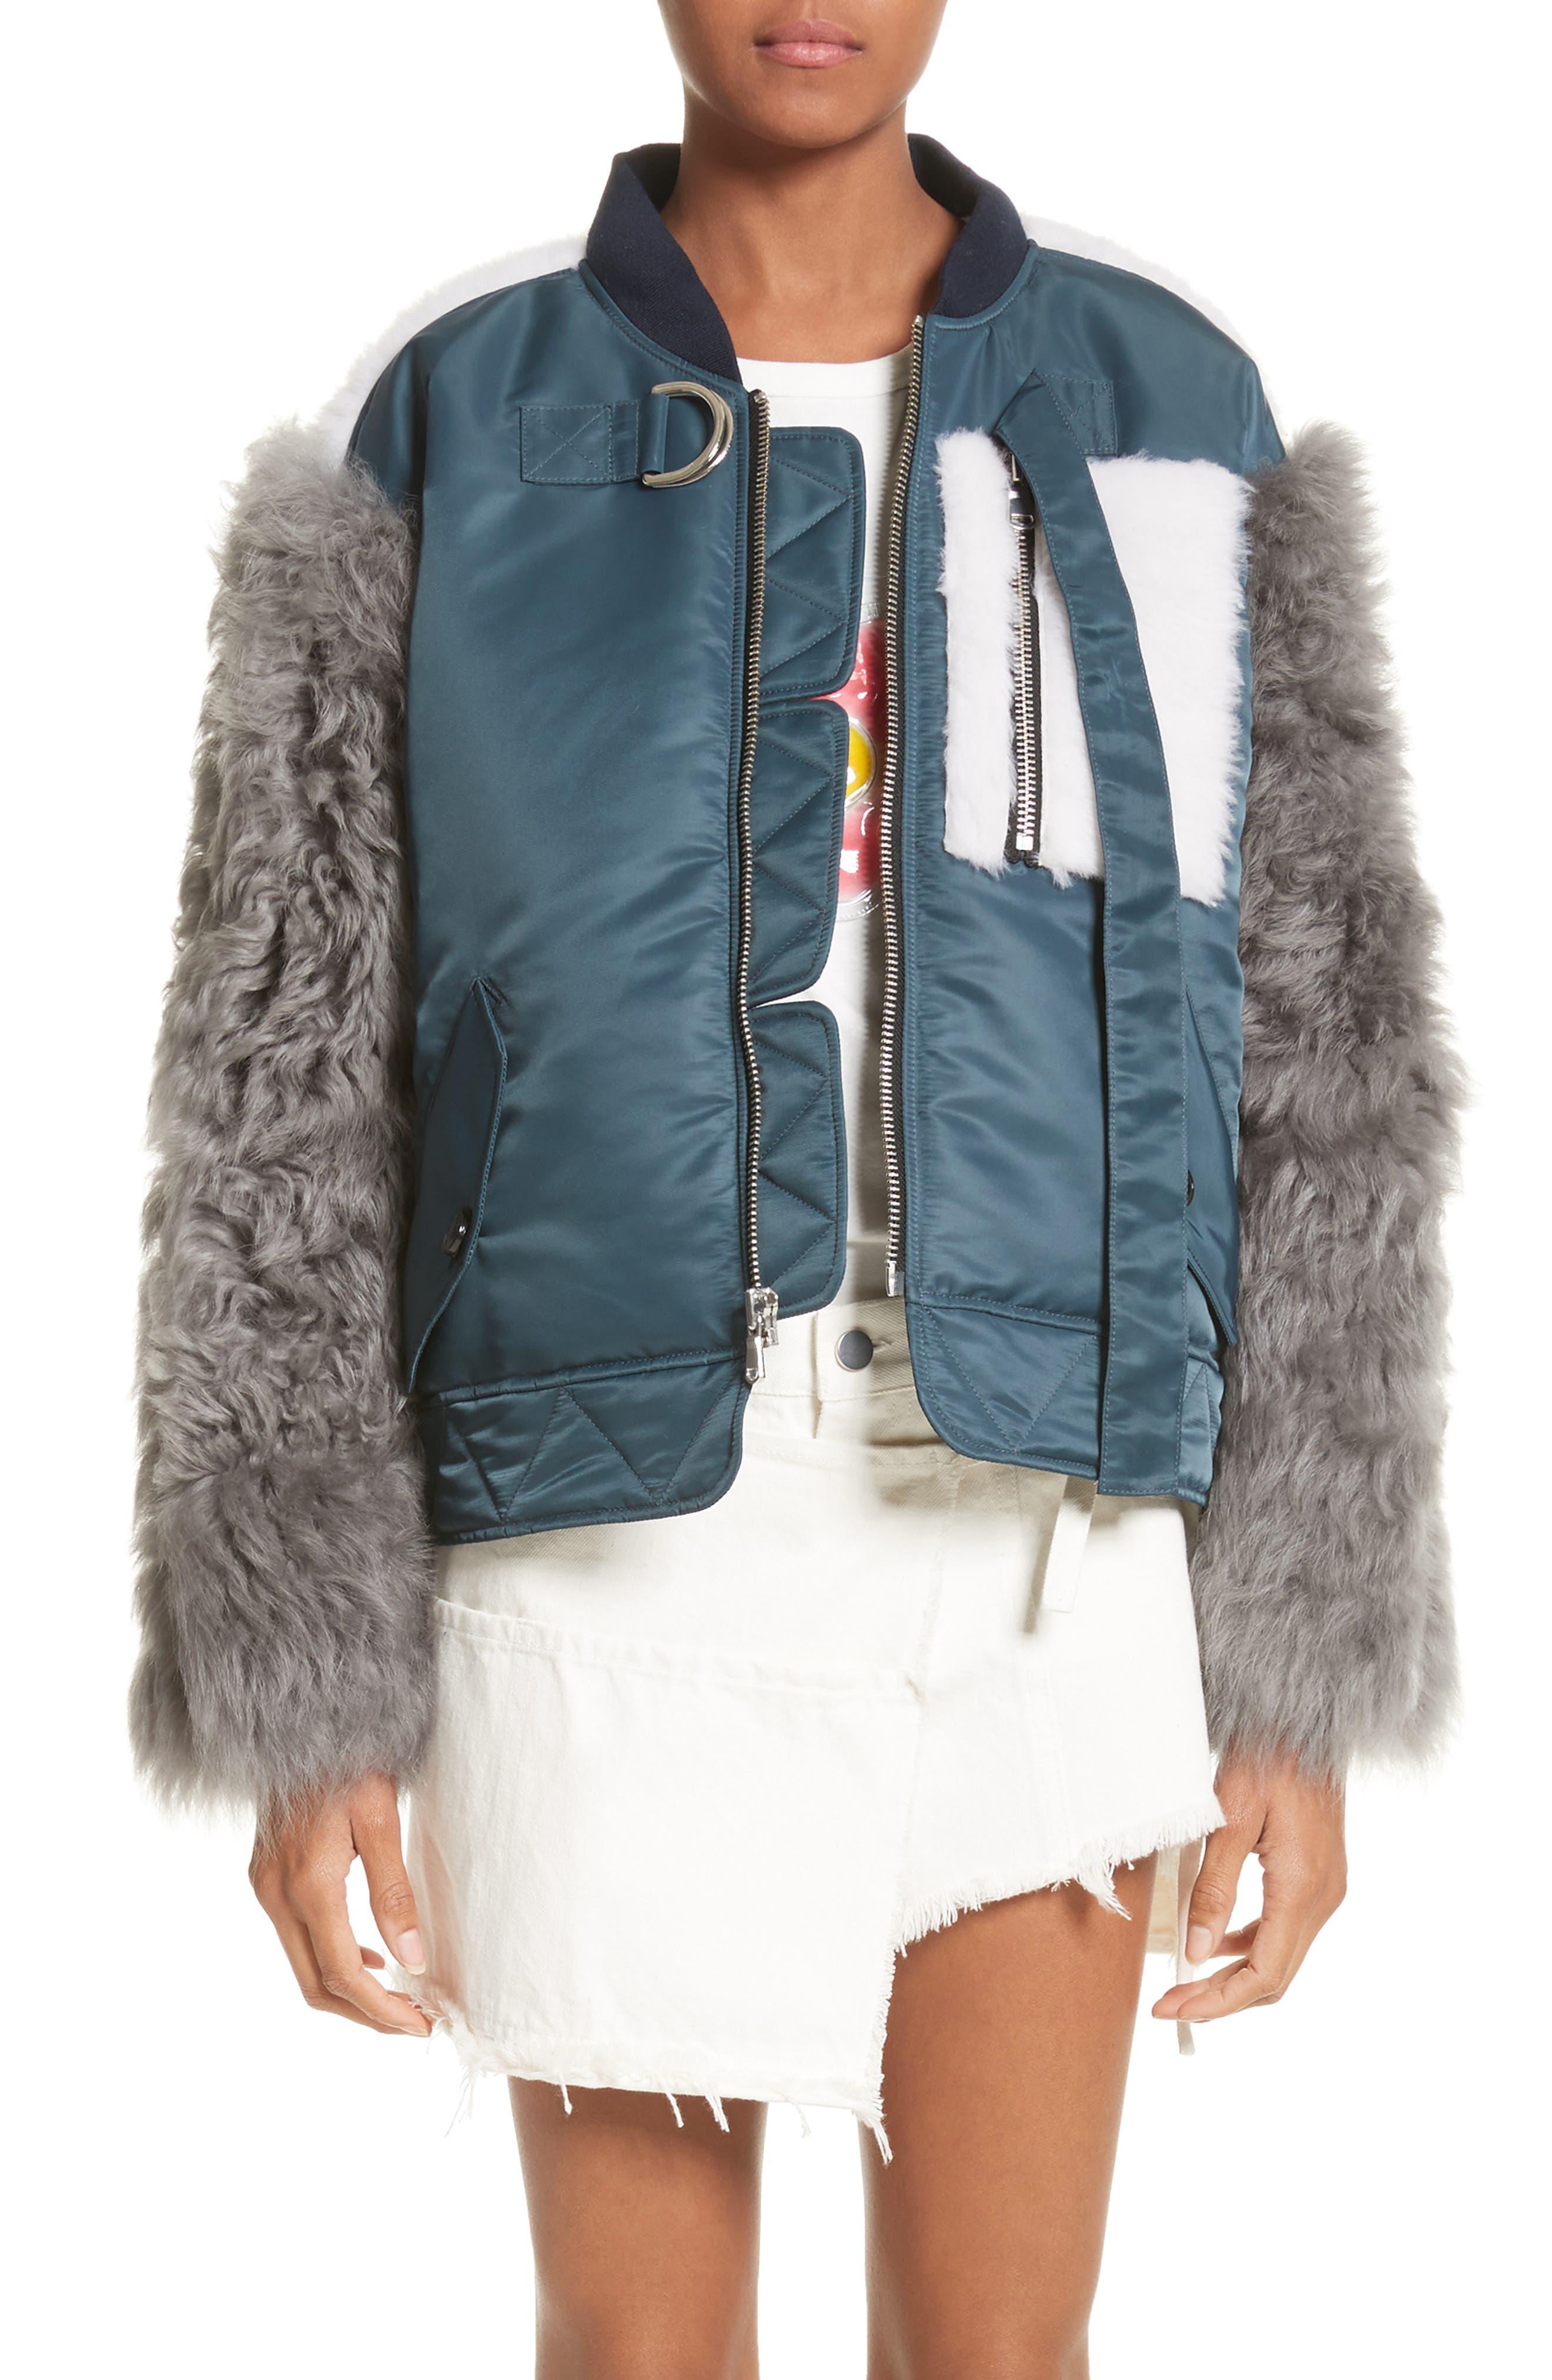 Peter Genuine Shearling Sleeve Jacket,                         Main,                         color, 410